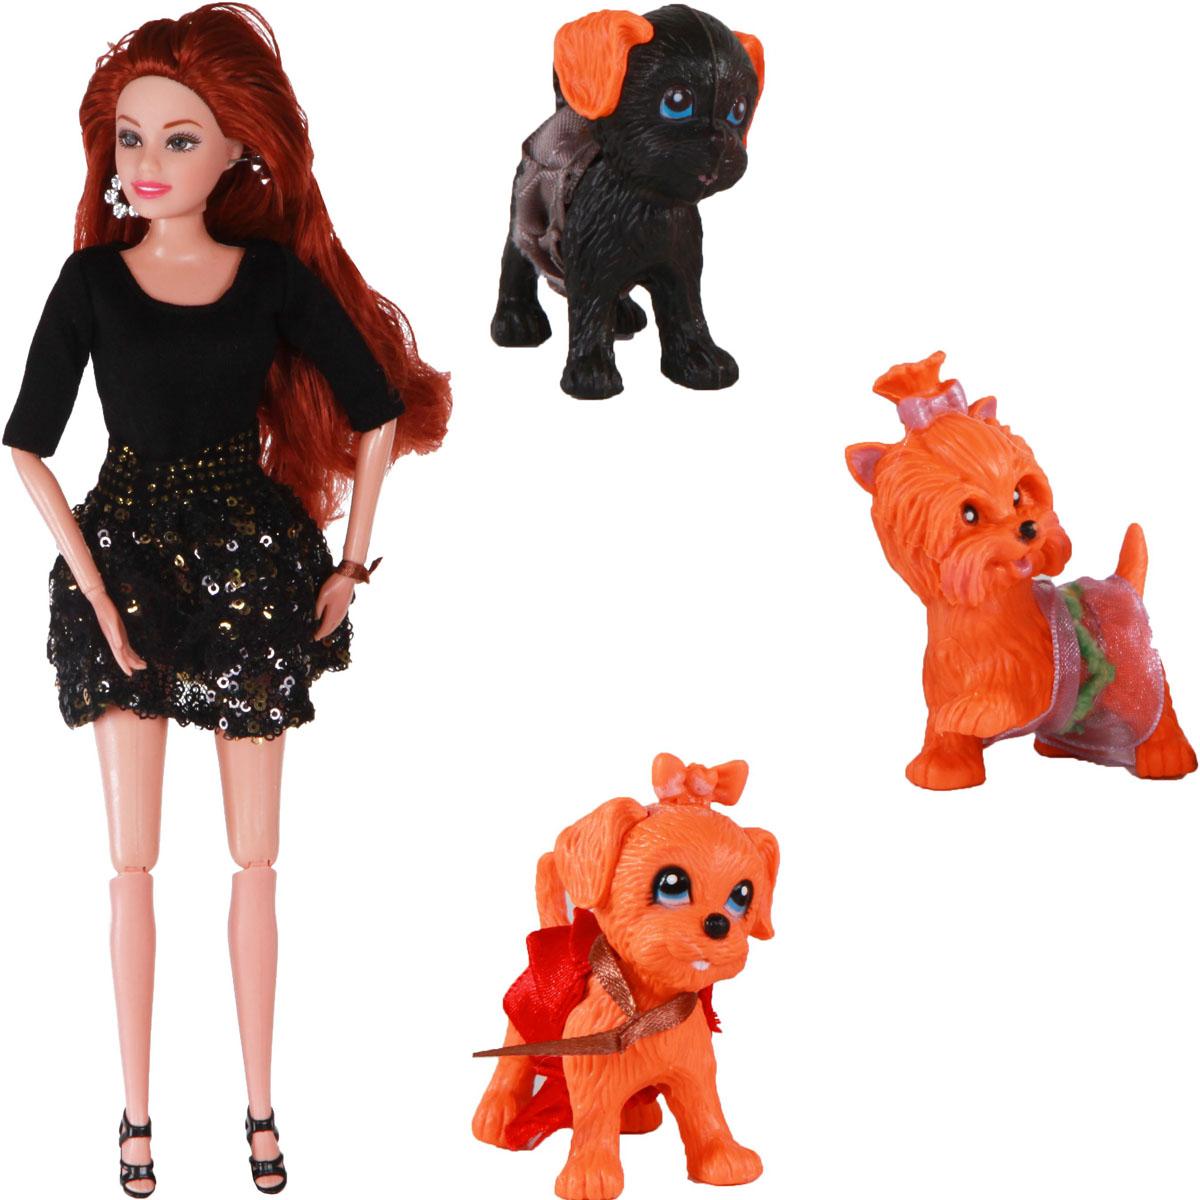 Yako Кукла Жанетт и забавные друзья M6583-1 кукла yako m6583 6